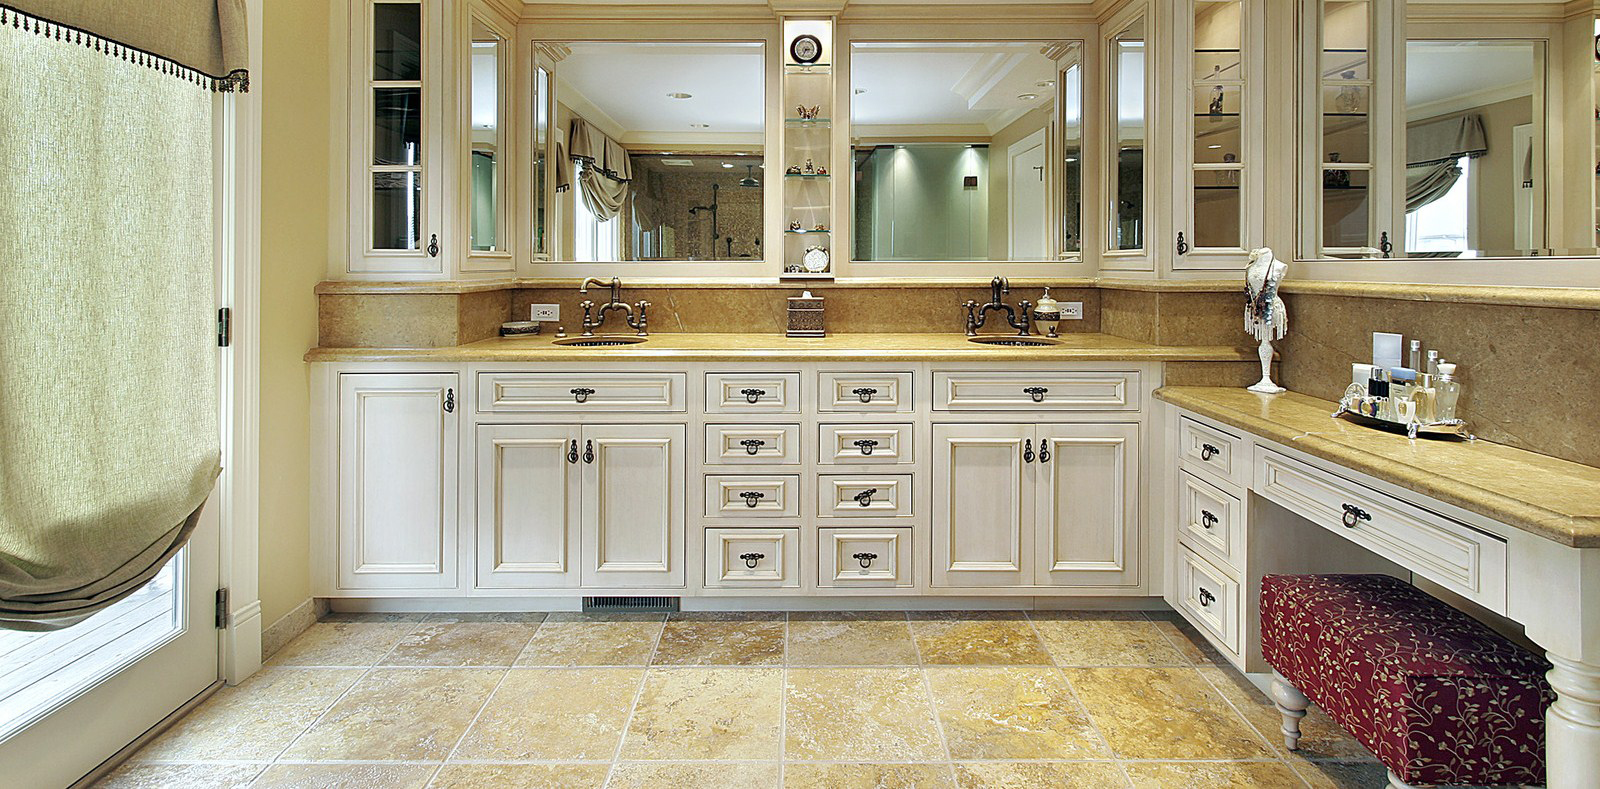 granite kitchen worktop granite countertops kitchen Kitchen Cleanliness Granite Worktops Makes Easy Cleaning My